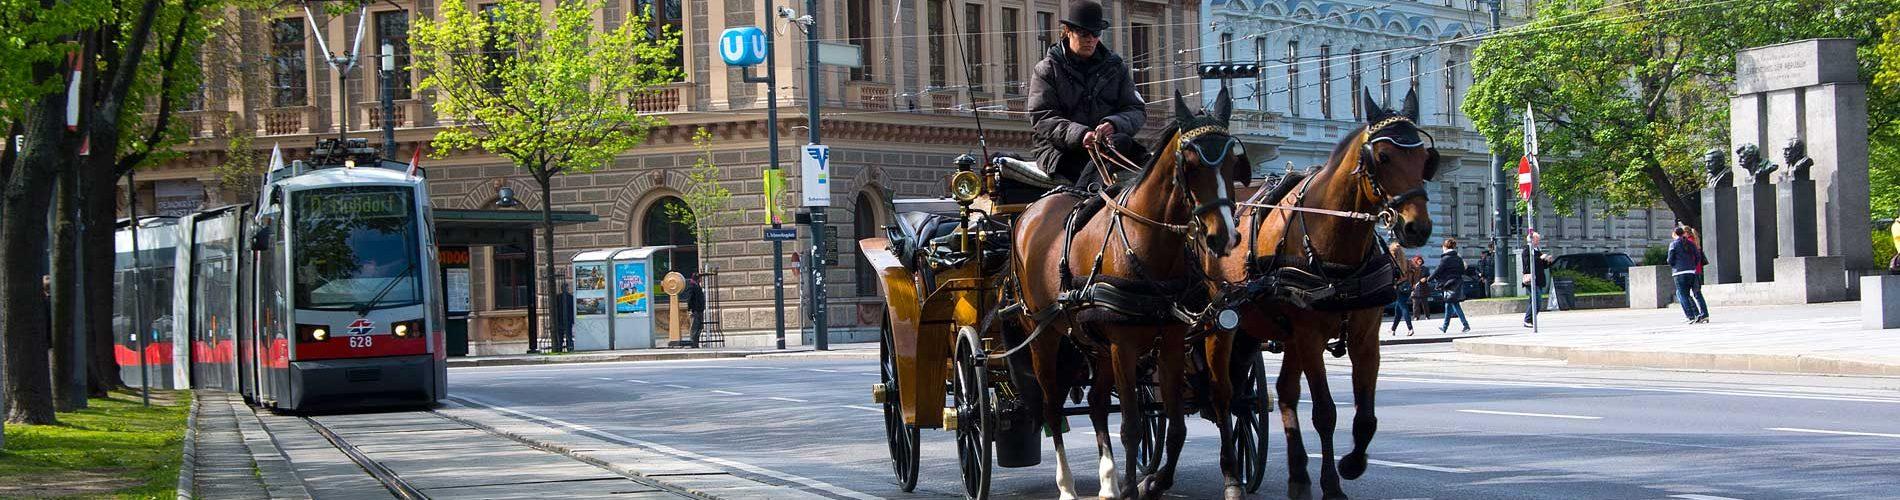 Tram-horses-carriage-header